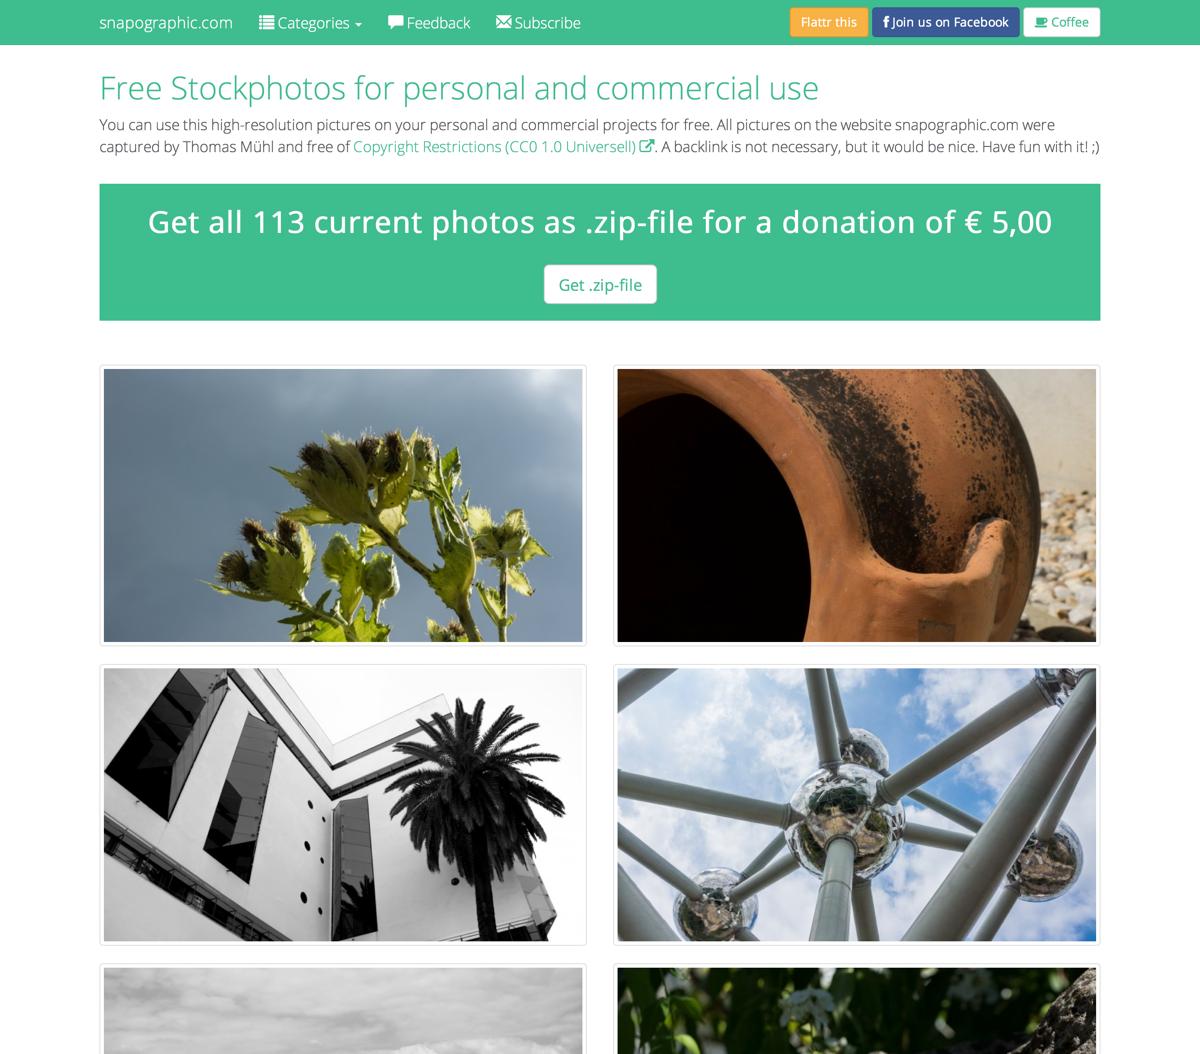 snapographic 25 Free Stock Photo Websites